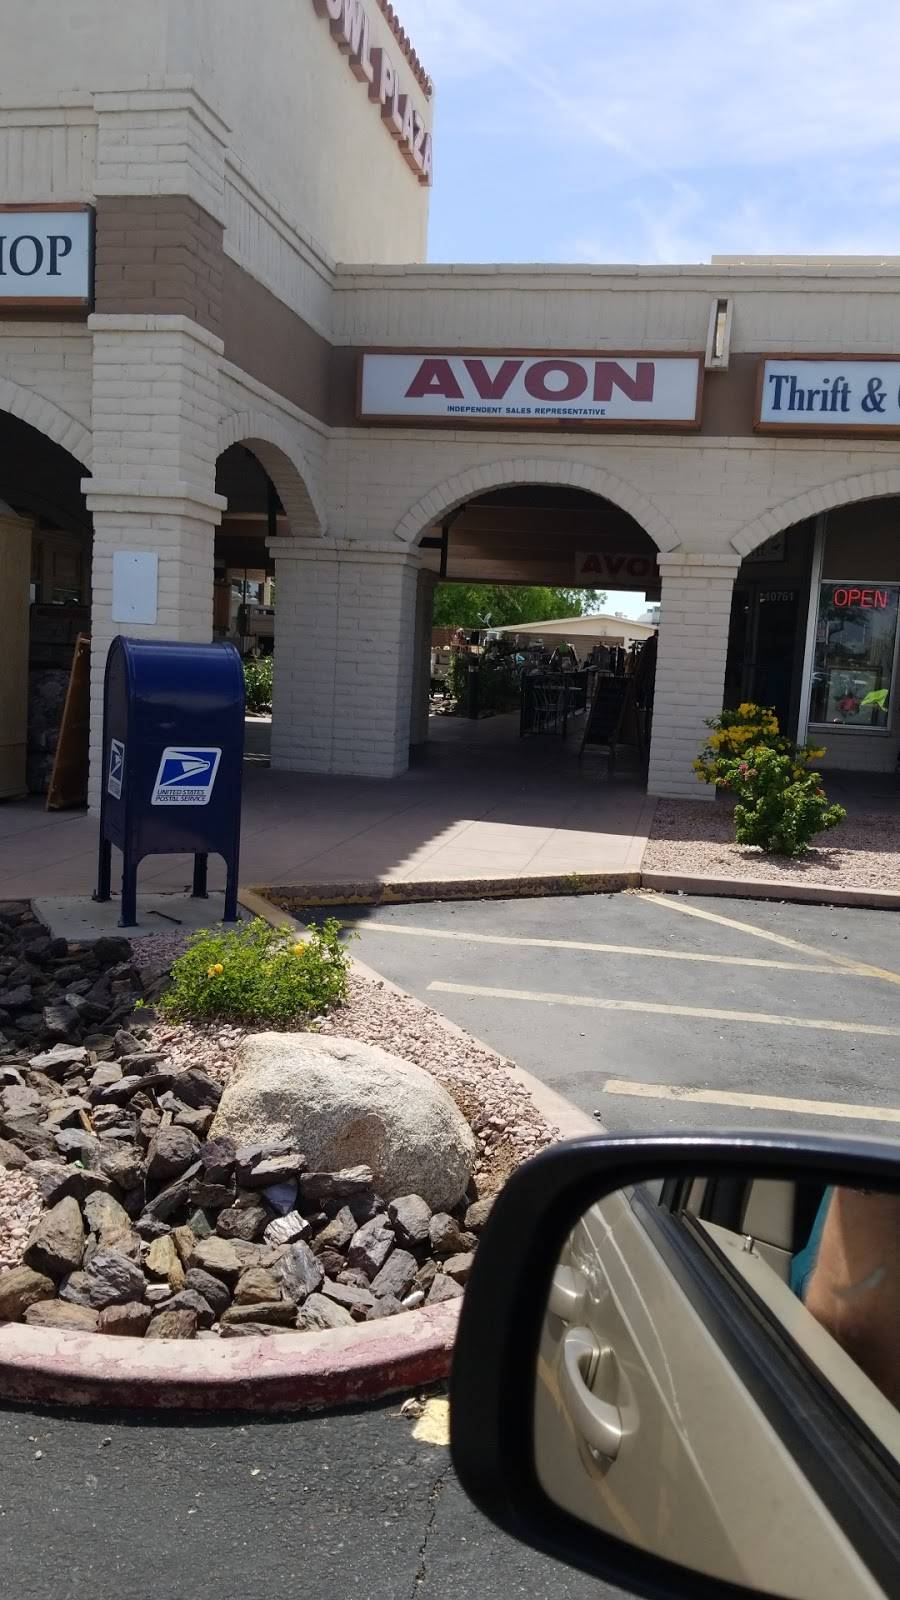 Avon For You - store  | Photo 2 of 2 | Address: 10743 W Peoria Ave, Sun City, AZ 85351, USA | Phone: (623) 583-6121